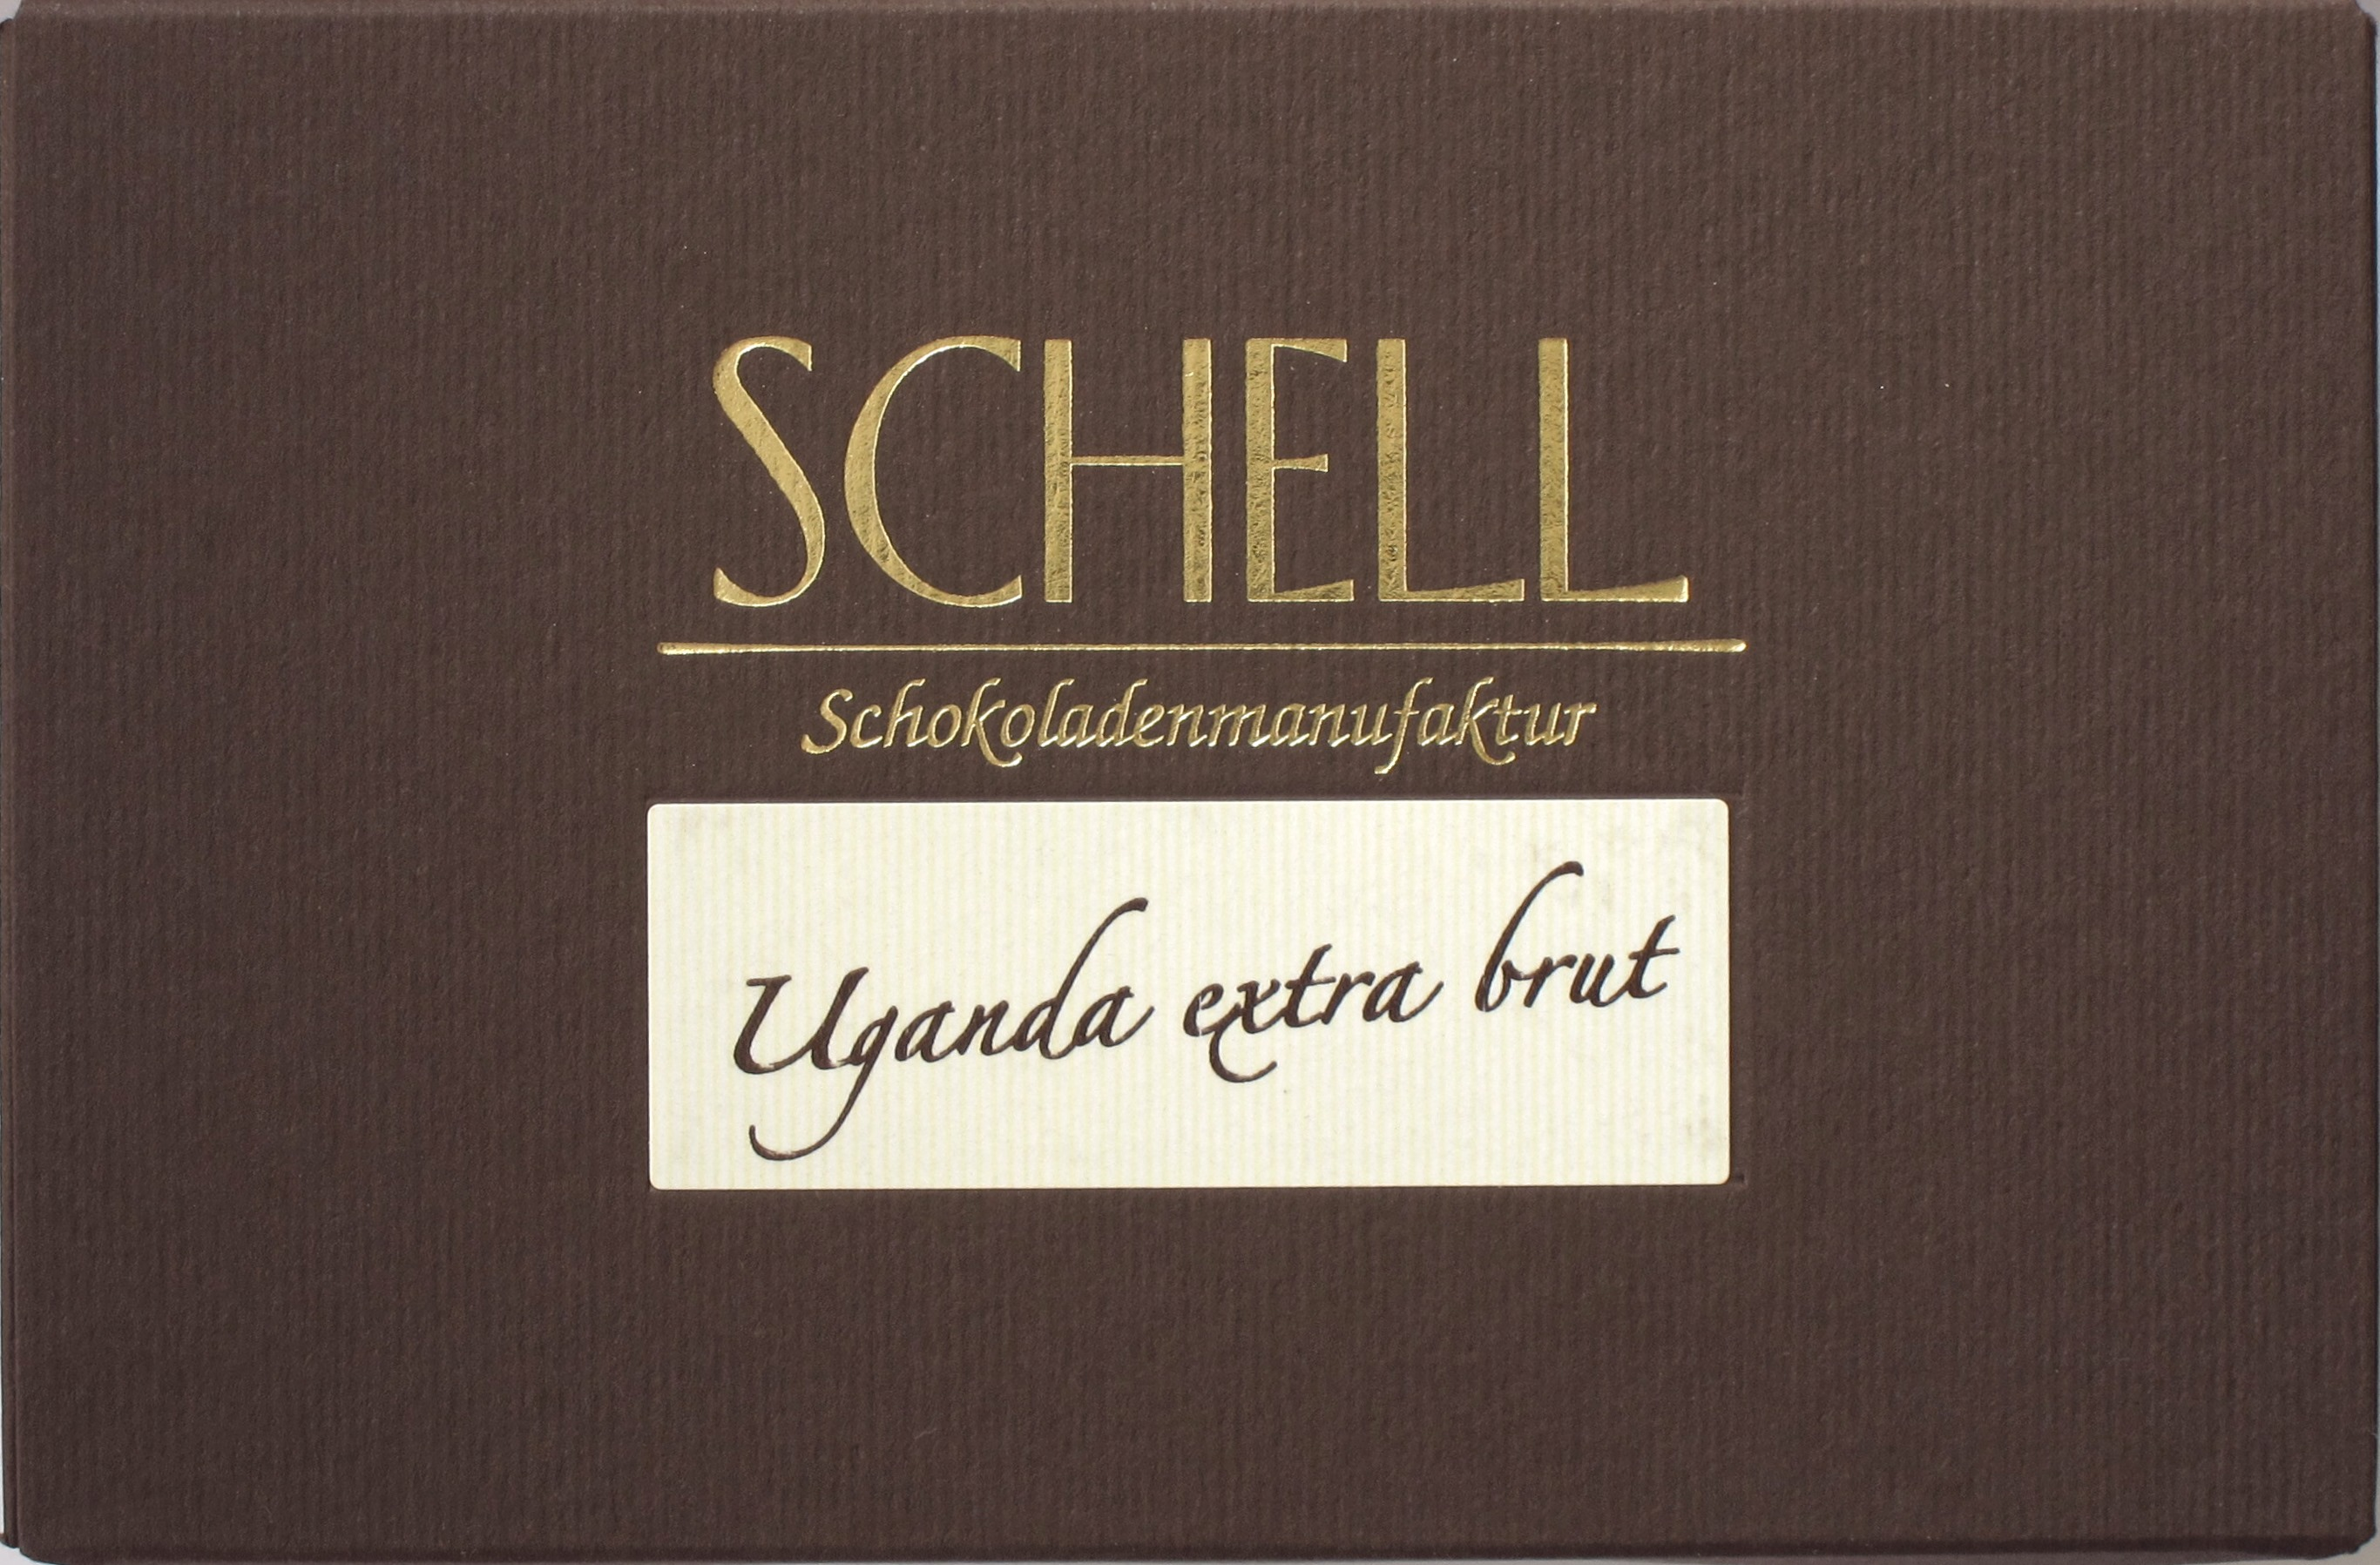 "Schell-Schokolade ""Uganda extra brut"" 85%"